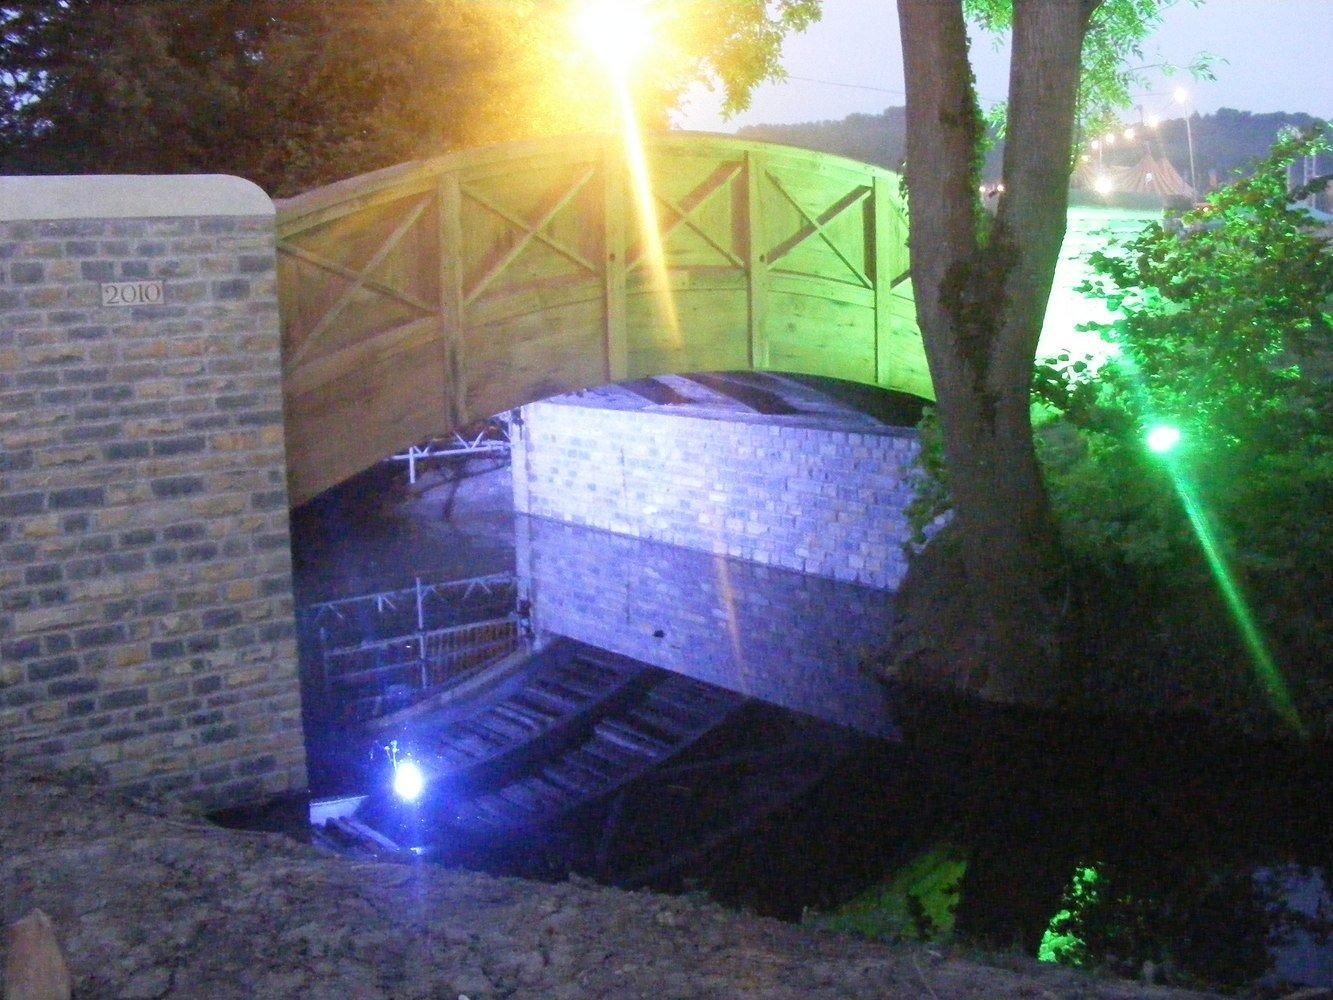 Bella's Bridge over the Whitelake River, on the site of the Glastonbury Festival. Illuminated with coloured lights